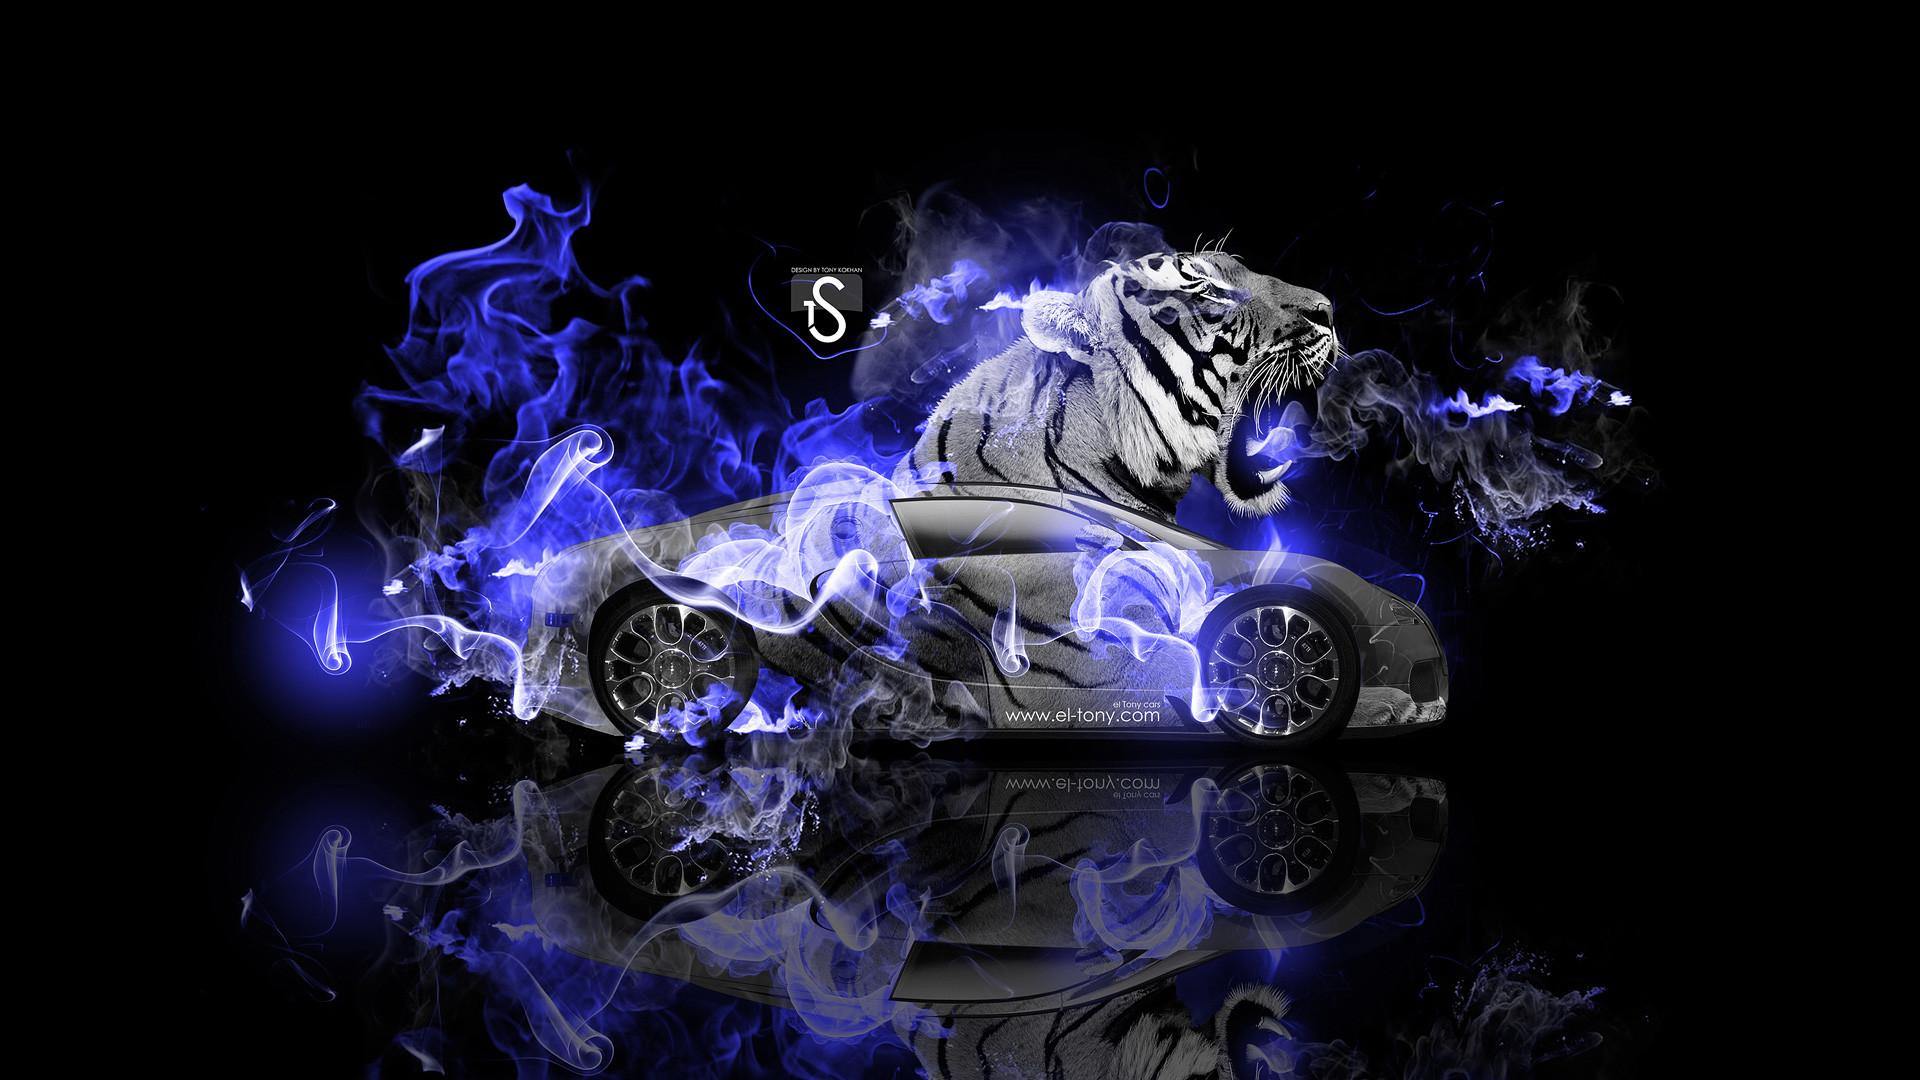 Res: 1920x1080, Bugatti-Veyron-Fantasy-Tiger-Blue-Fire-Car-2014-